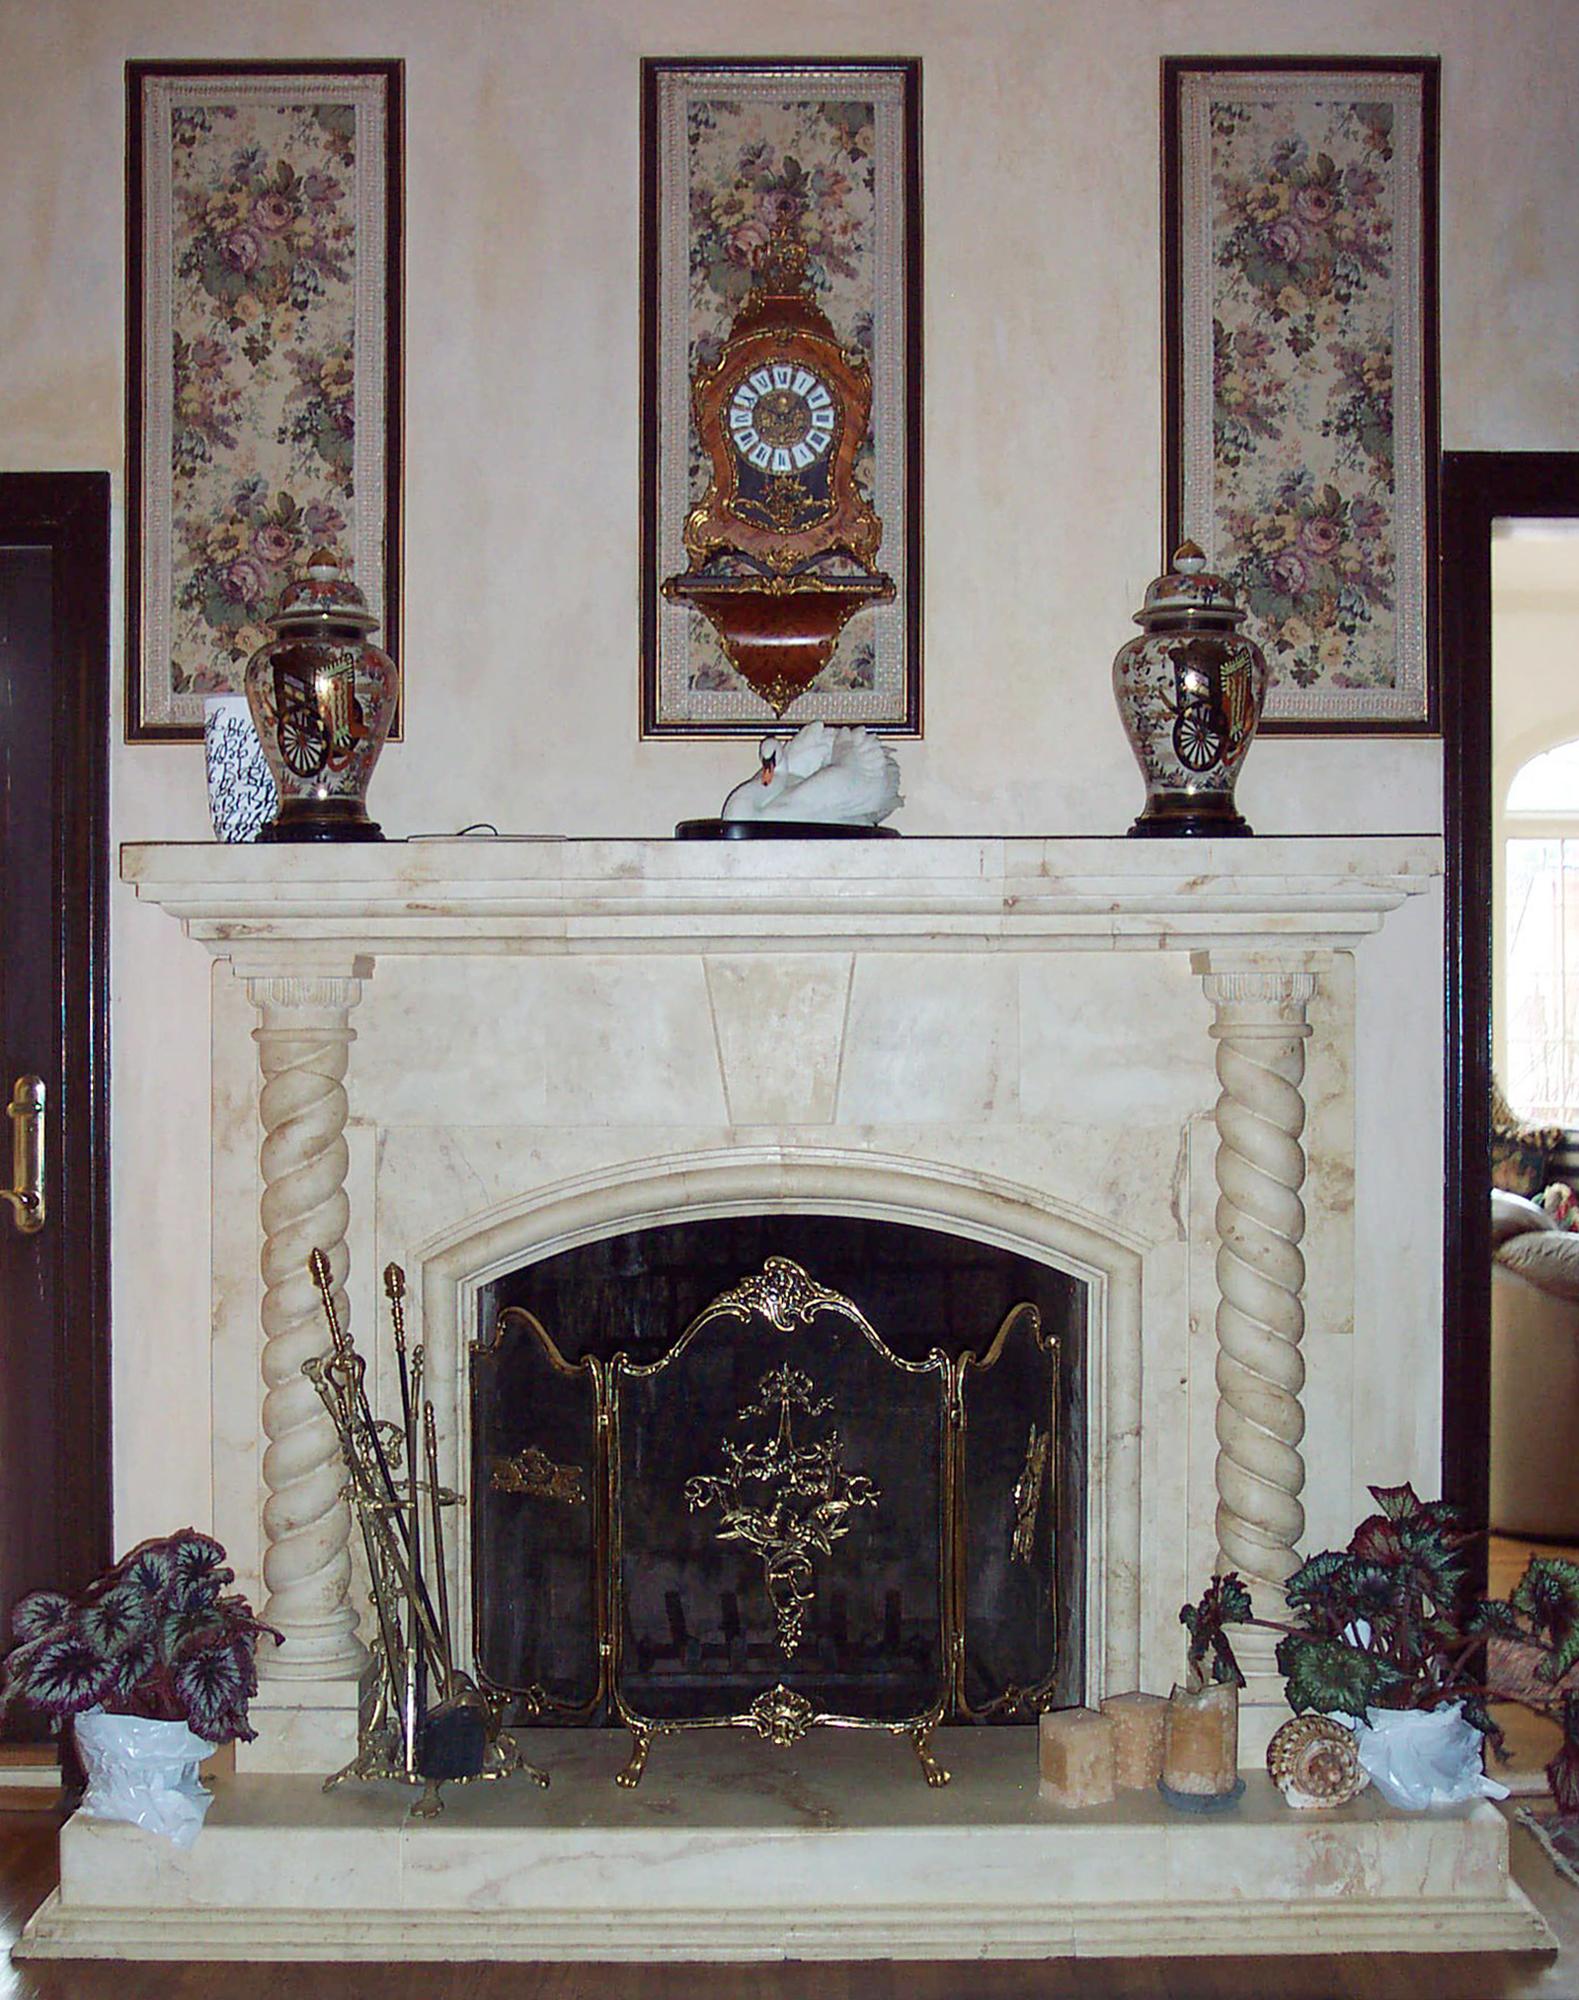 Classic Federal Style_Nasser_interior Fireplace_Arabesque_1579x2000_DCP_3025.jpg